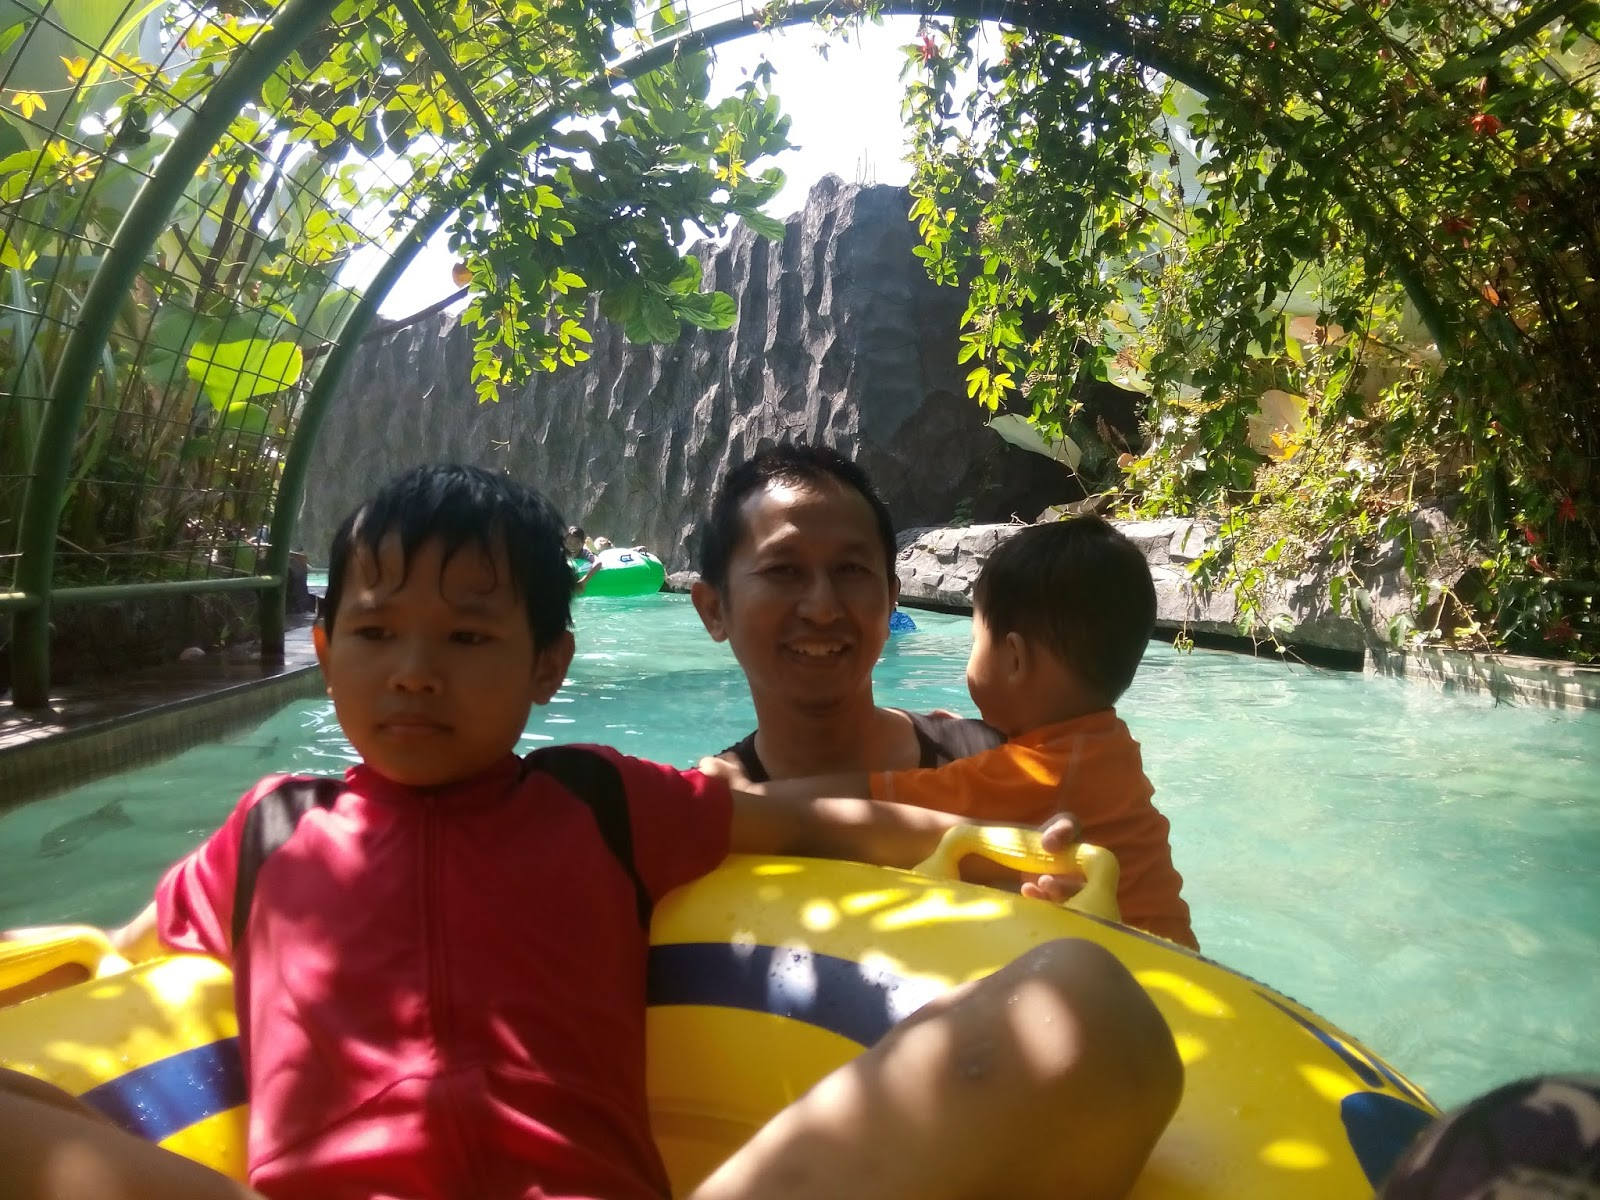 Journey Writing Skill Wisata Air Pesona Nirwana Terowongan Gua Tanaman